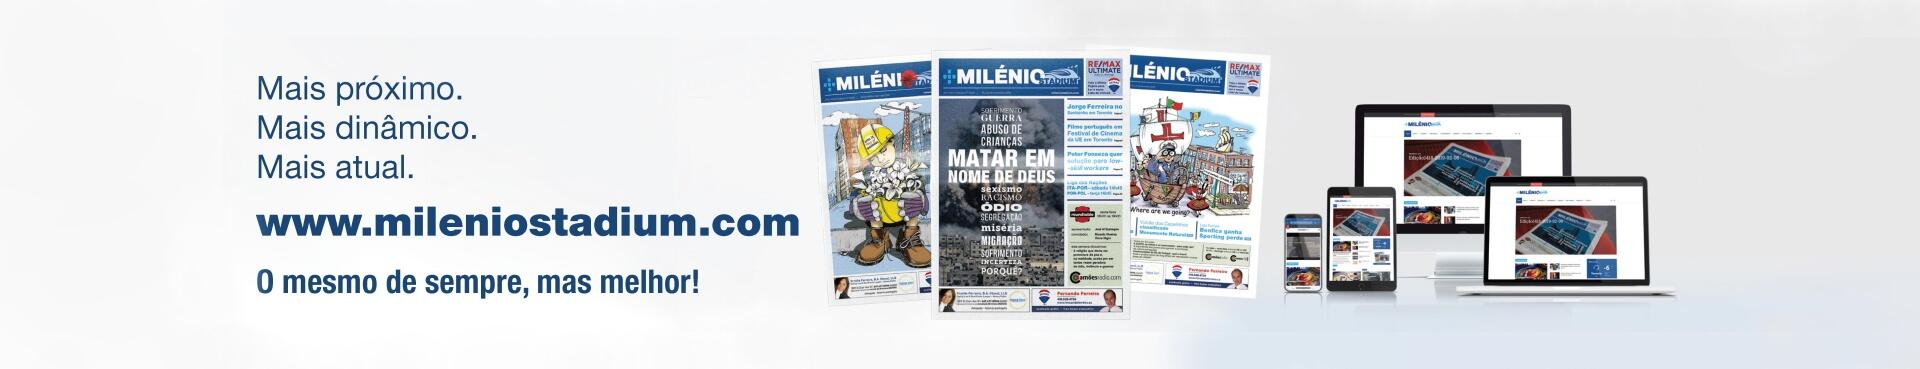 CamoesTV-MilenioStadium-banner